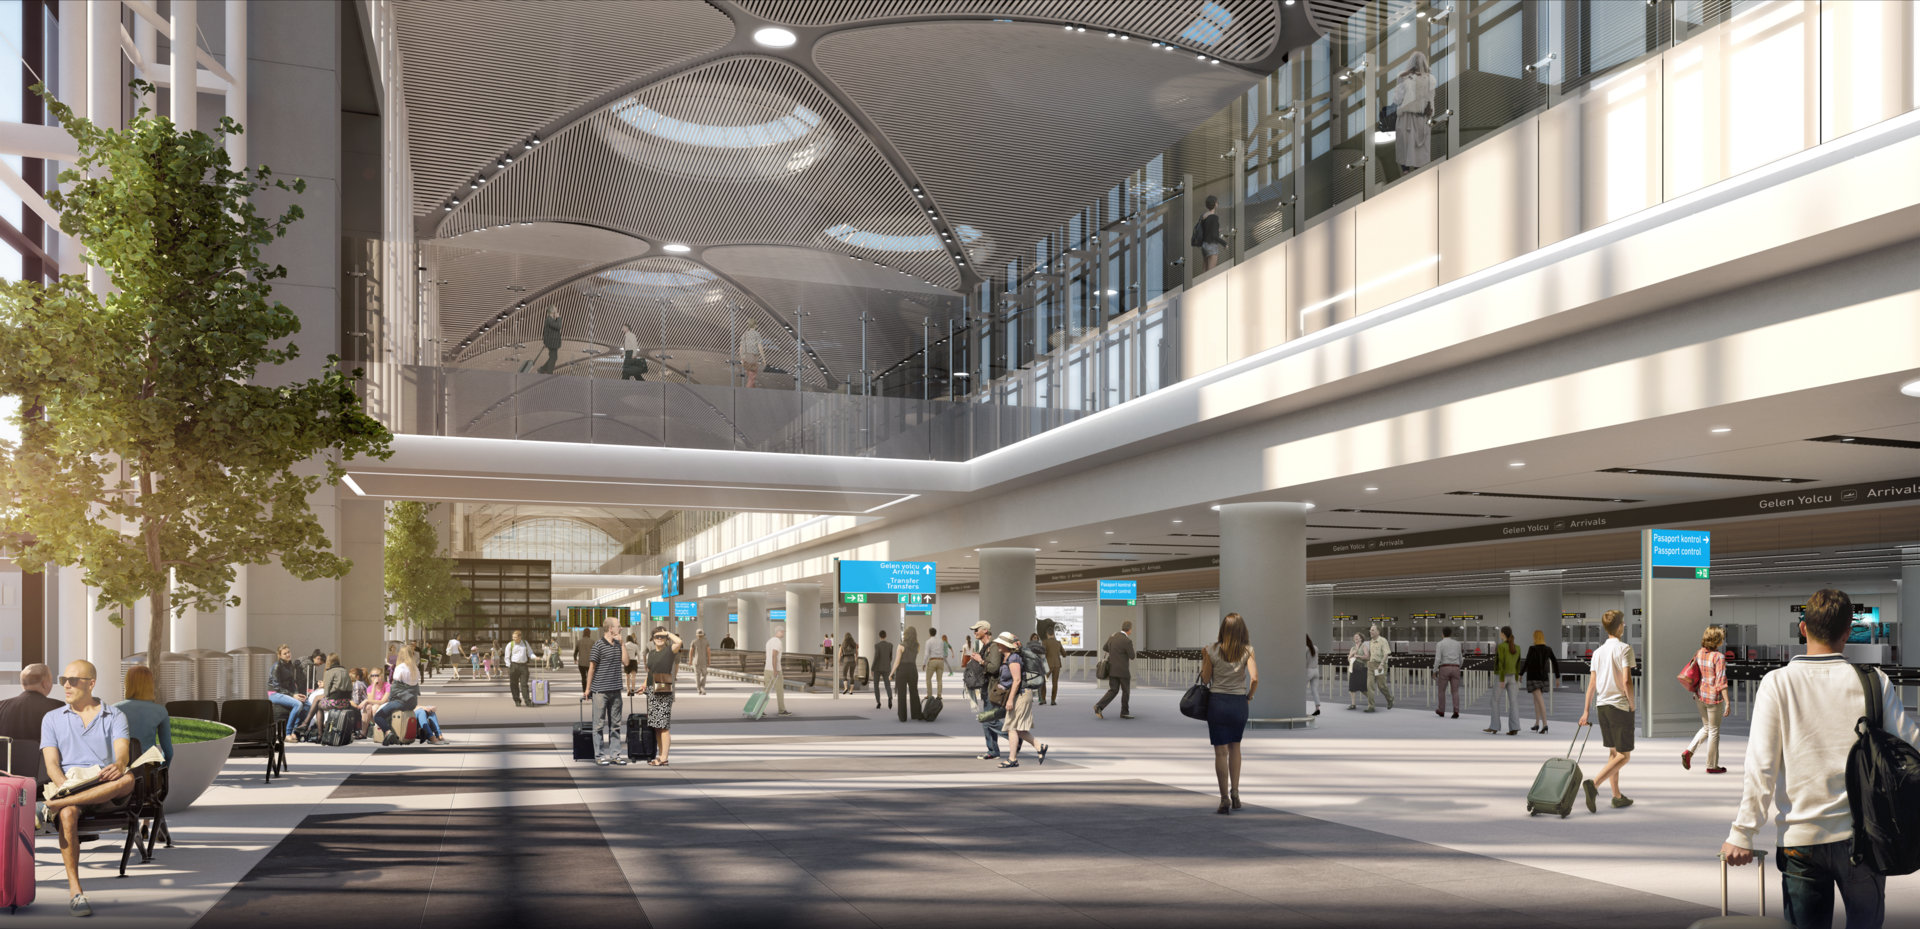 Türkei-ist airport new